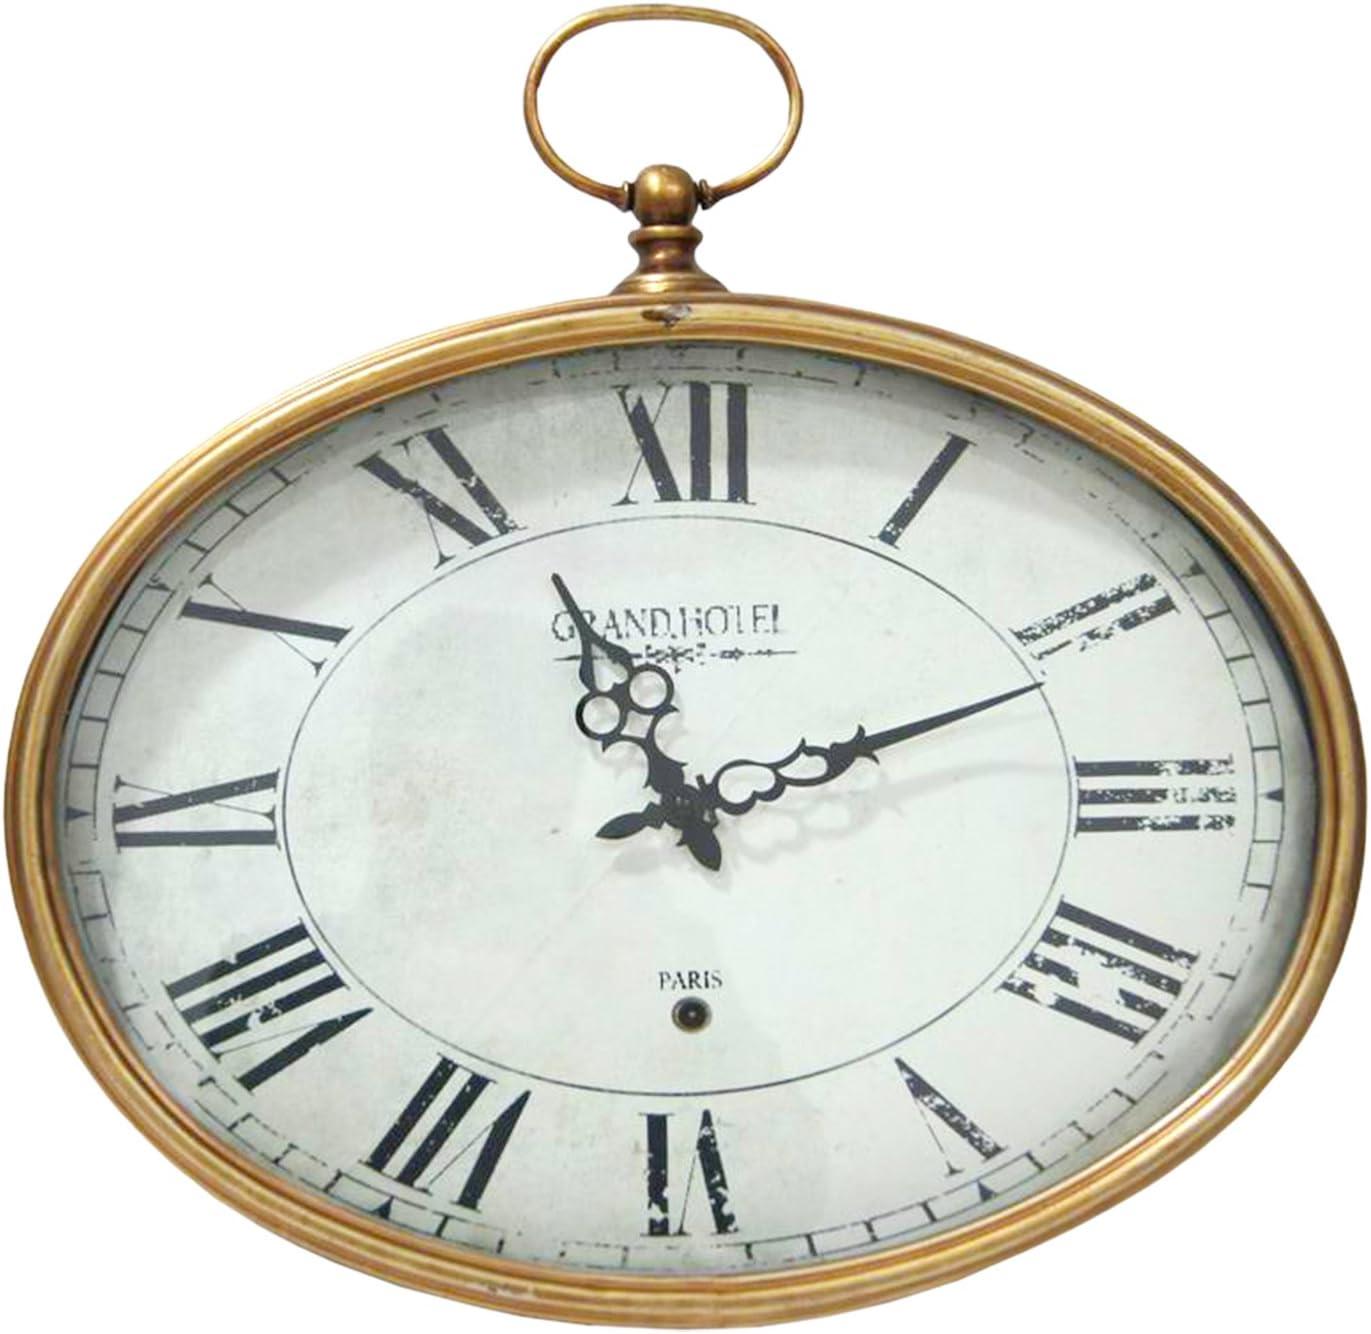 Stratton Home Decor S02199 Oval Wall Clock Gold Amazon Ca Home Kitchen